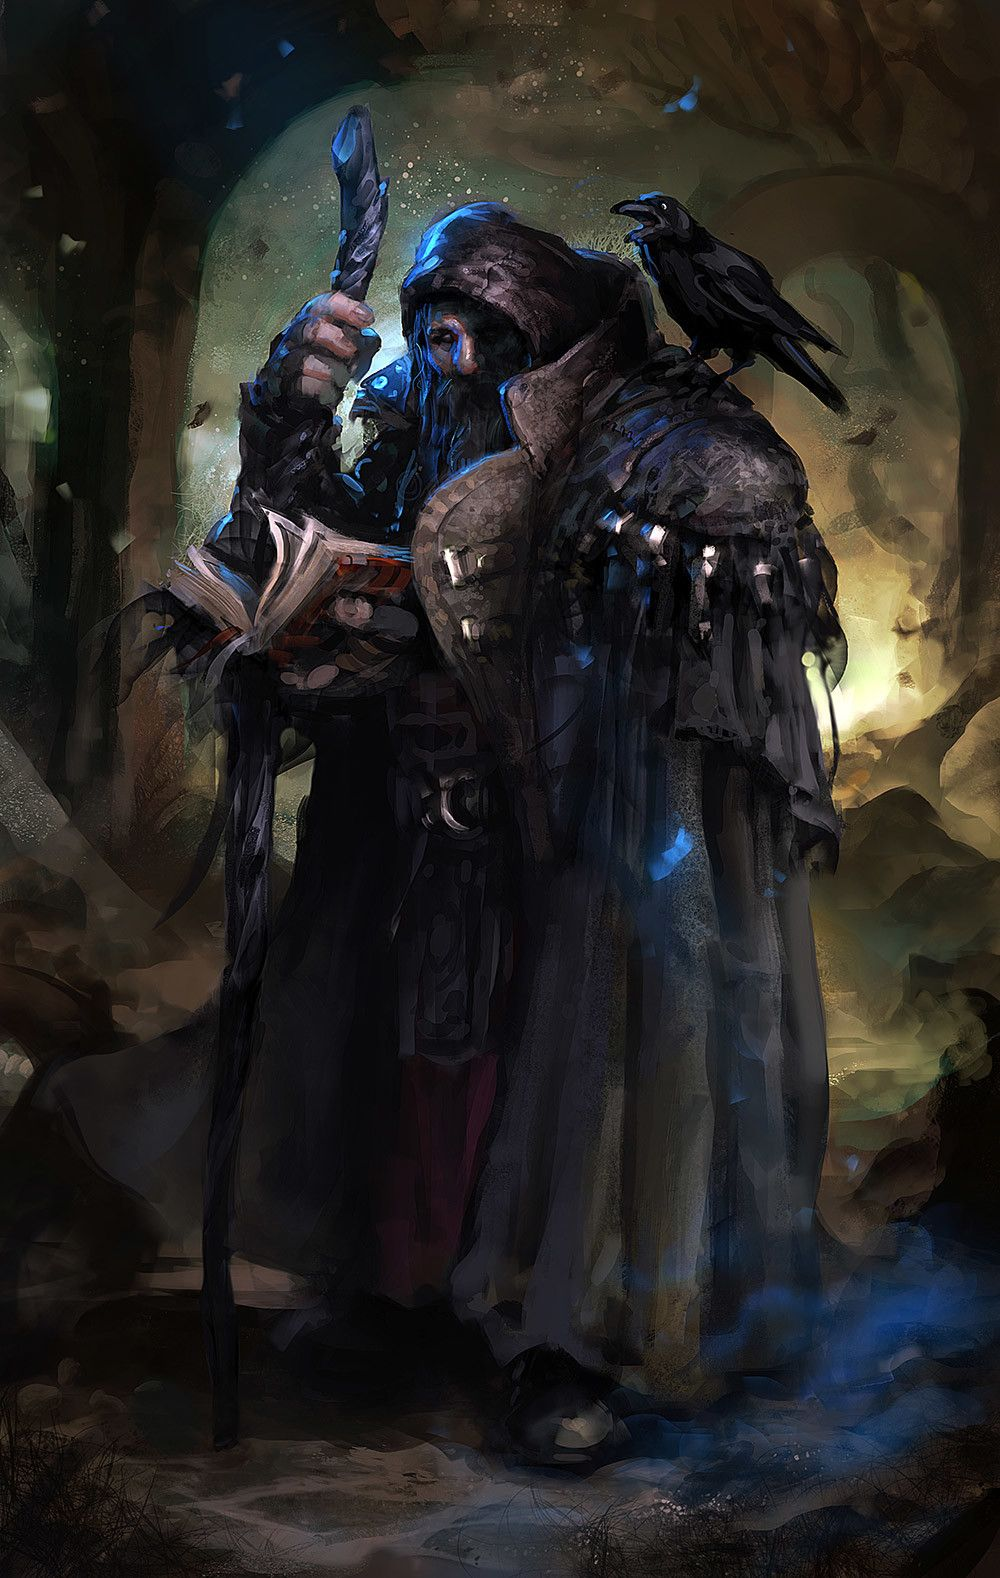 Grim Elder, Lukasz Jaskolski on ArtStation at https://www.artstation.com/artwork/aLGvq